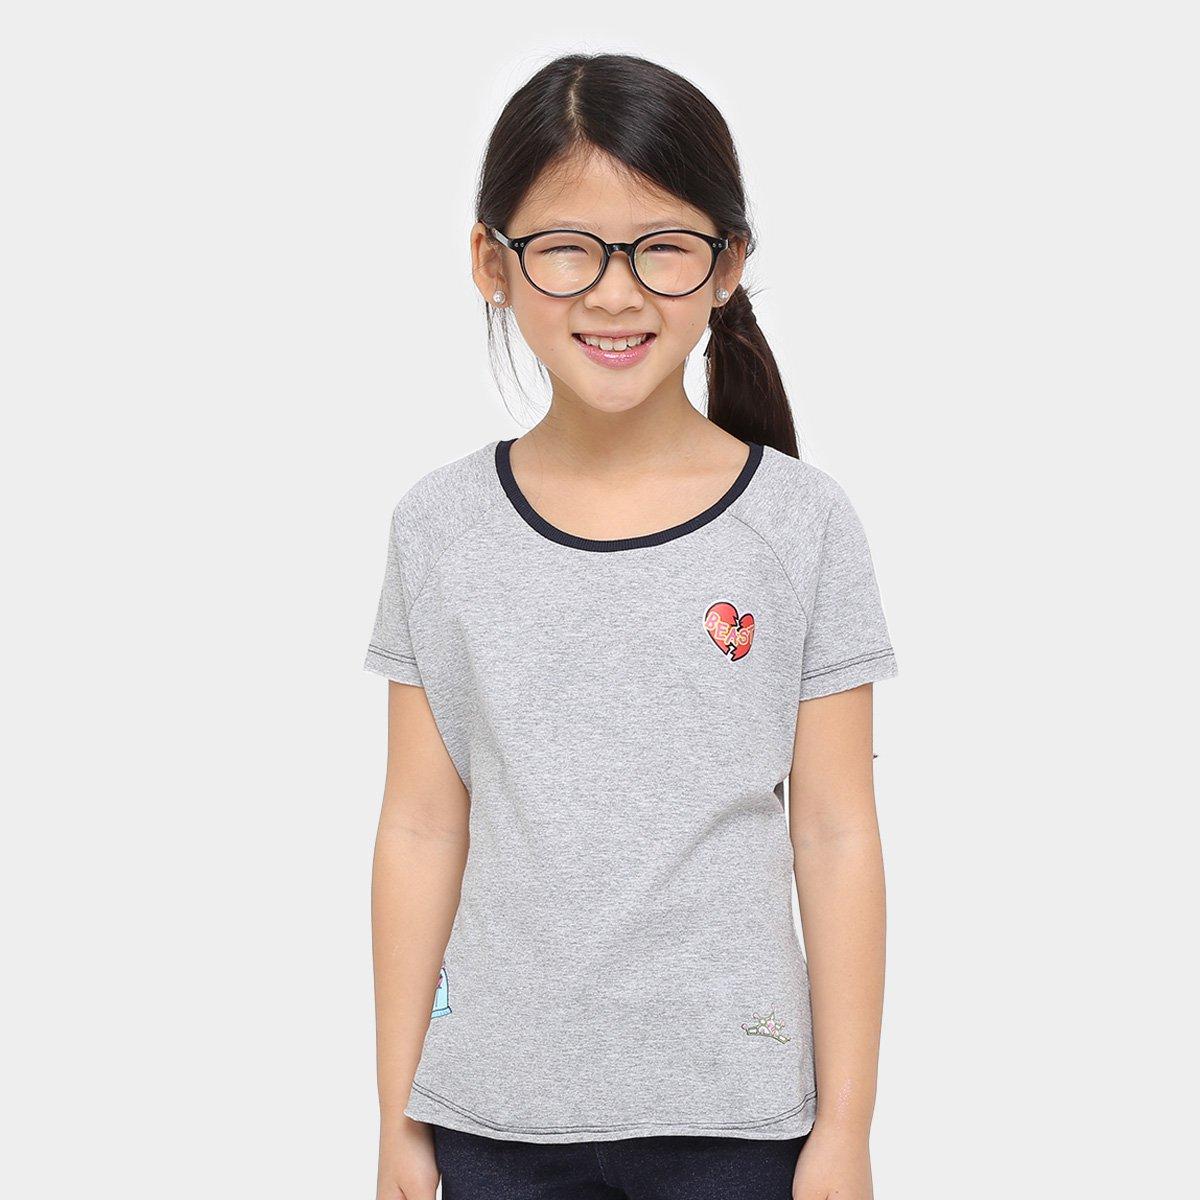 Disney Camiseta Patches Camiseta Disney Infantil Bela Mescla 6vE4Pw